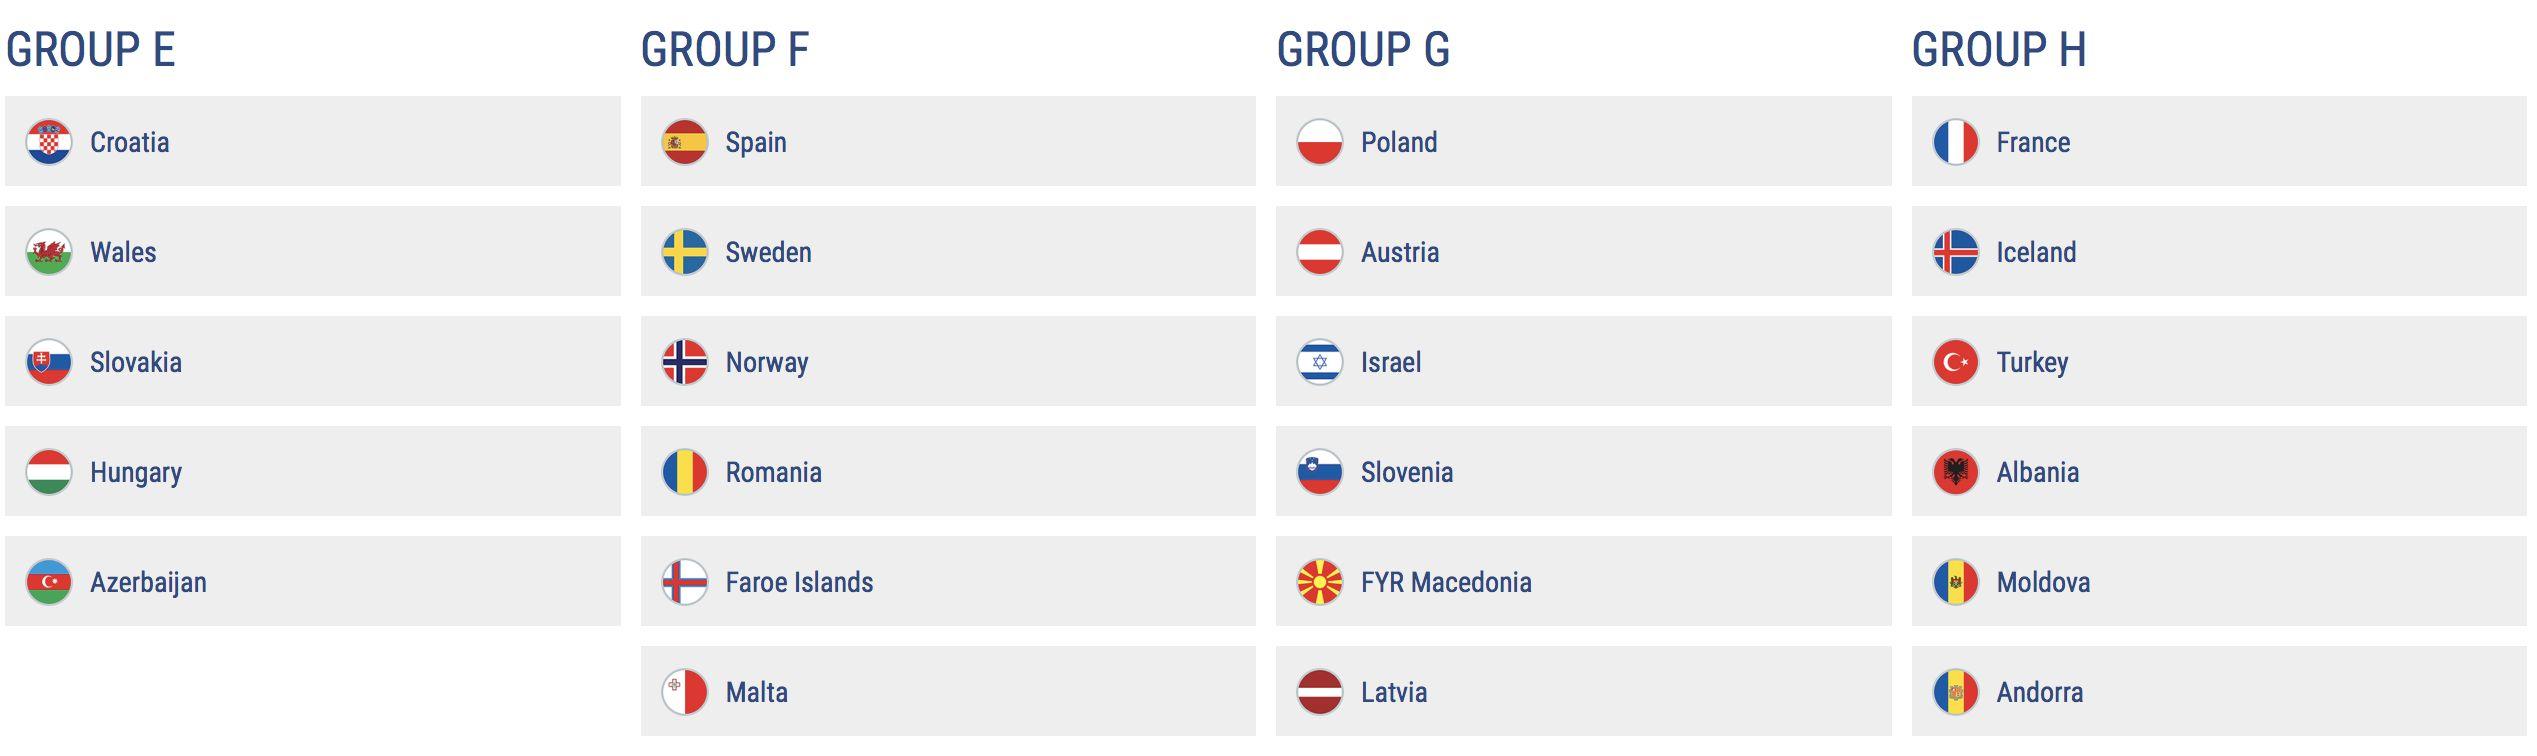 Euro 2020 Qualifying Draw Croatia In Group E With Wales Croatia Week